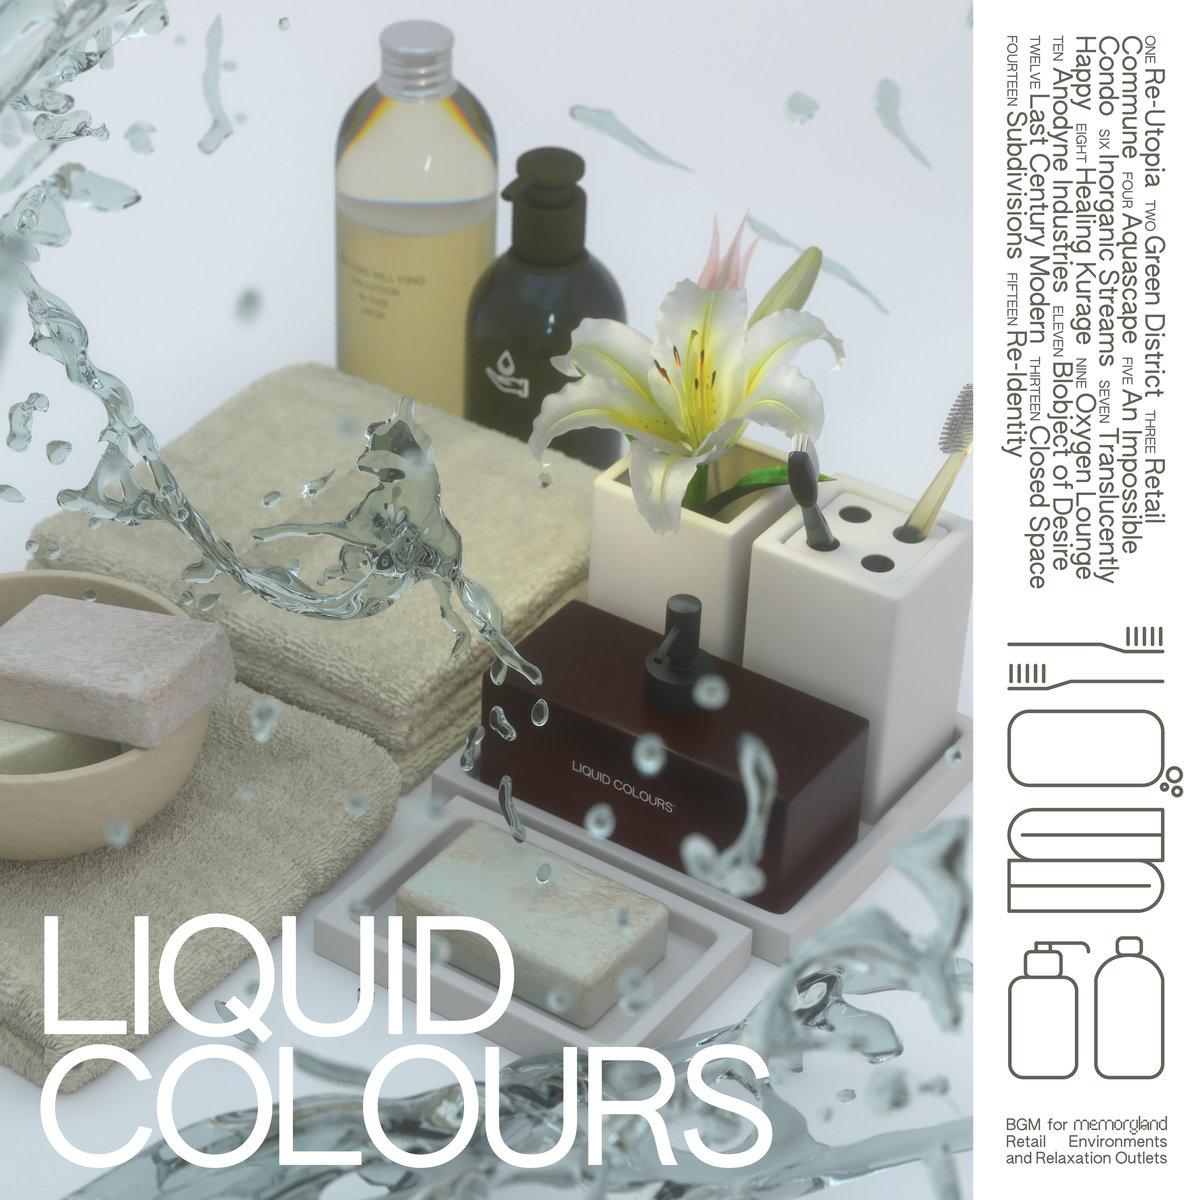 CFCF 'Liquid Colours'